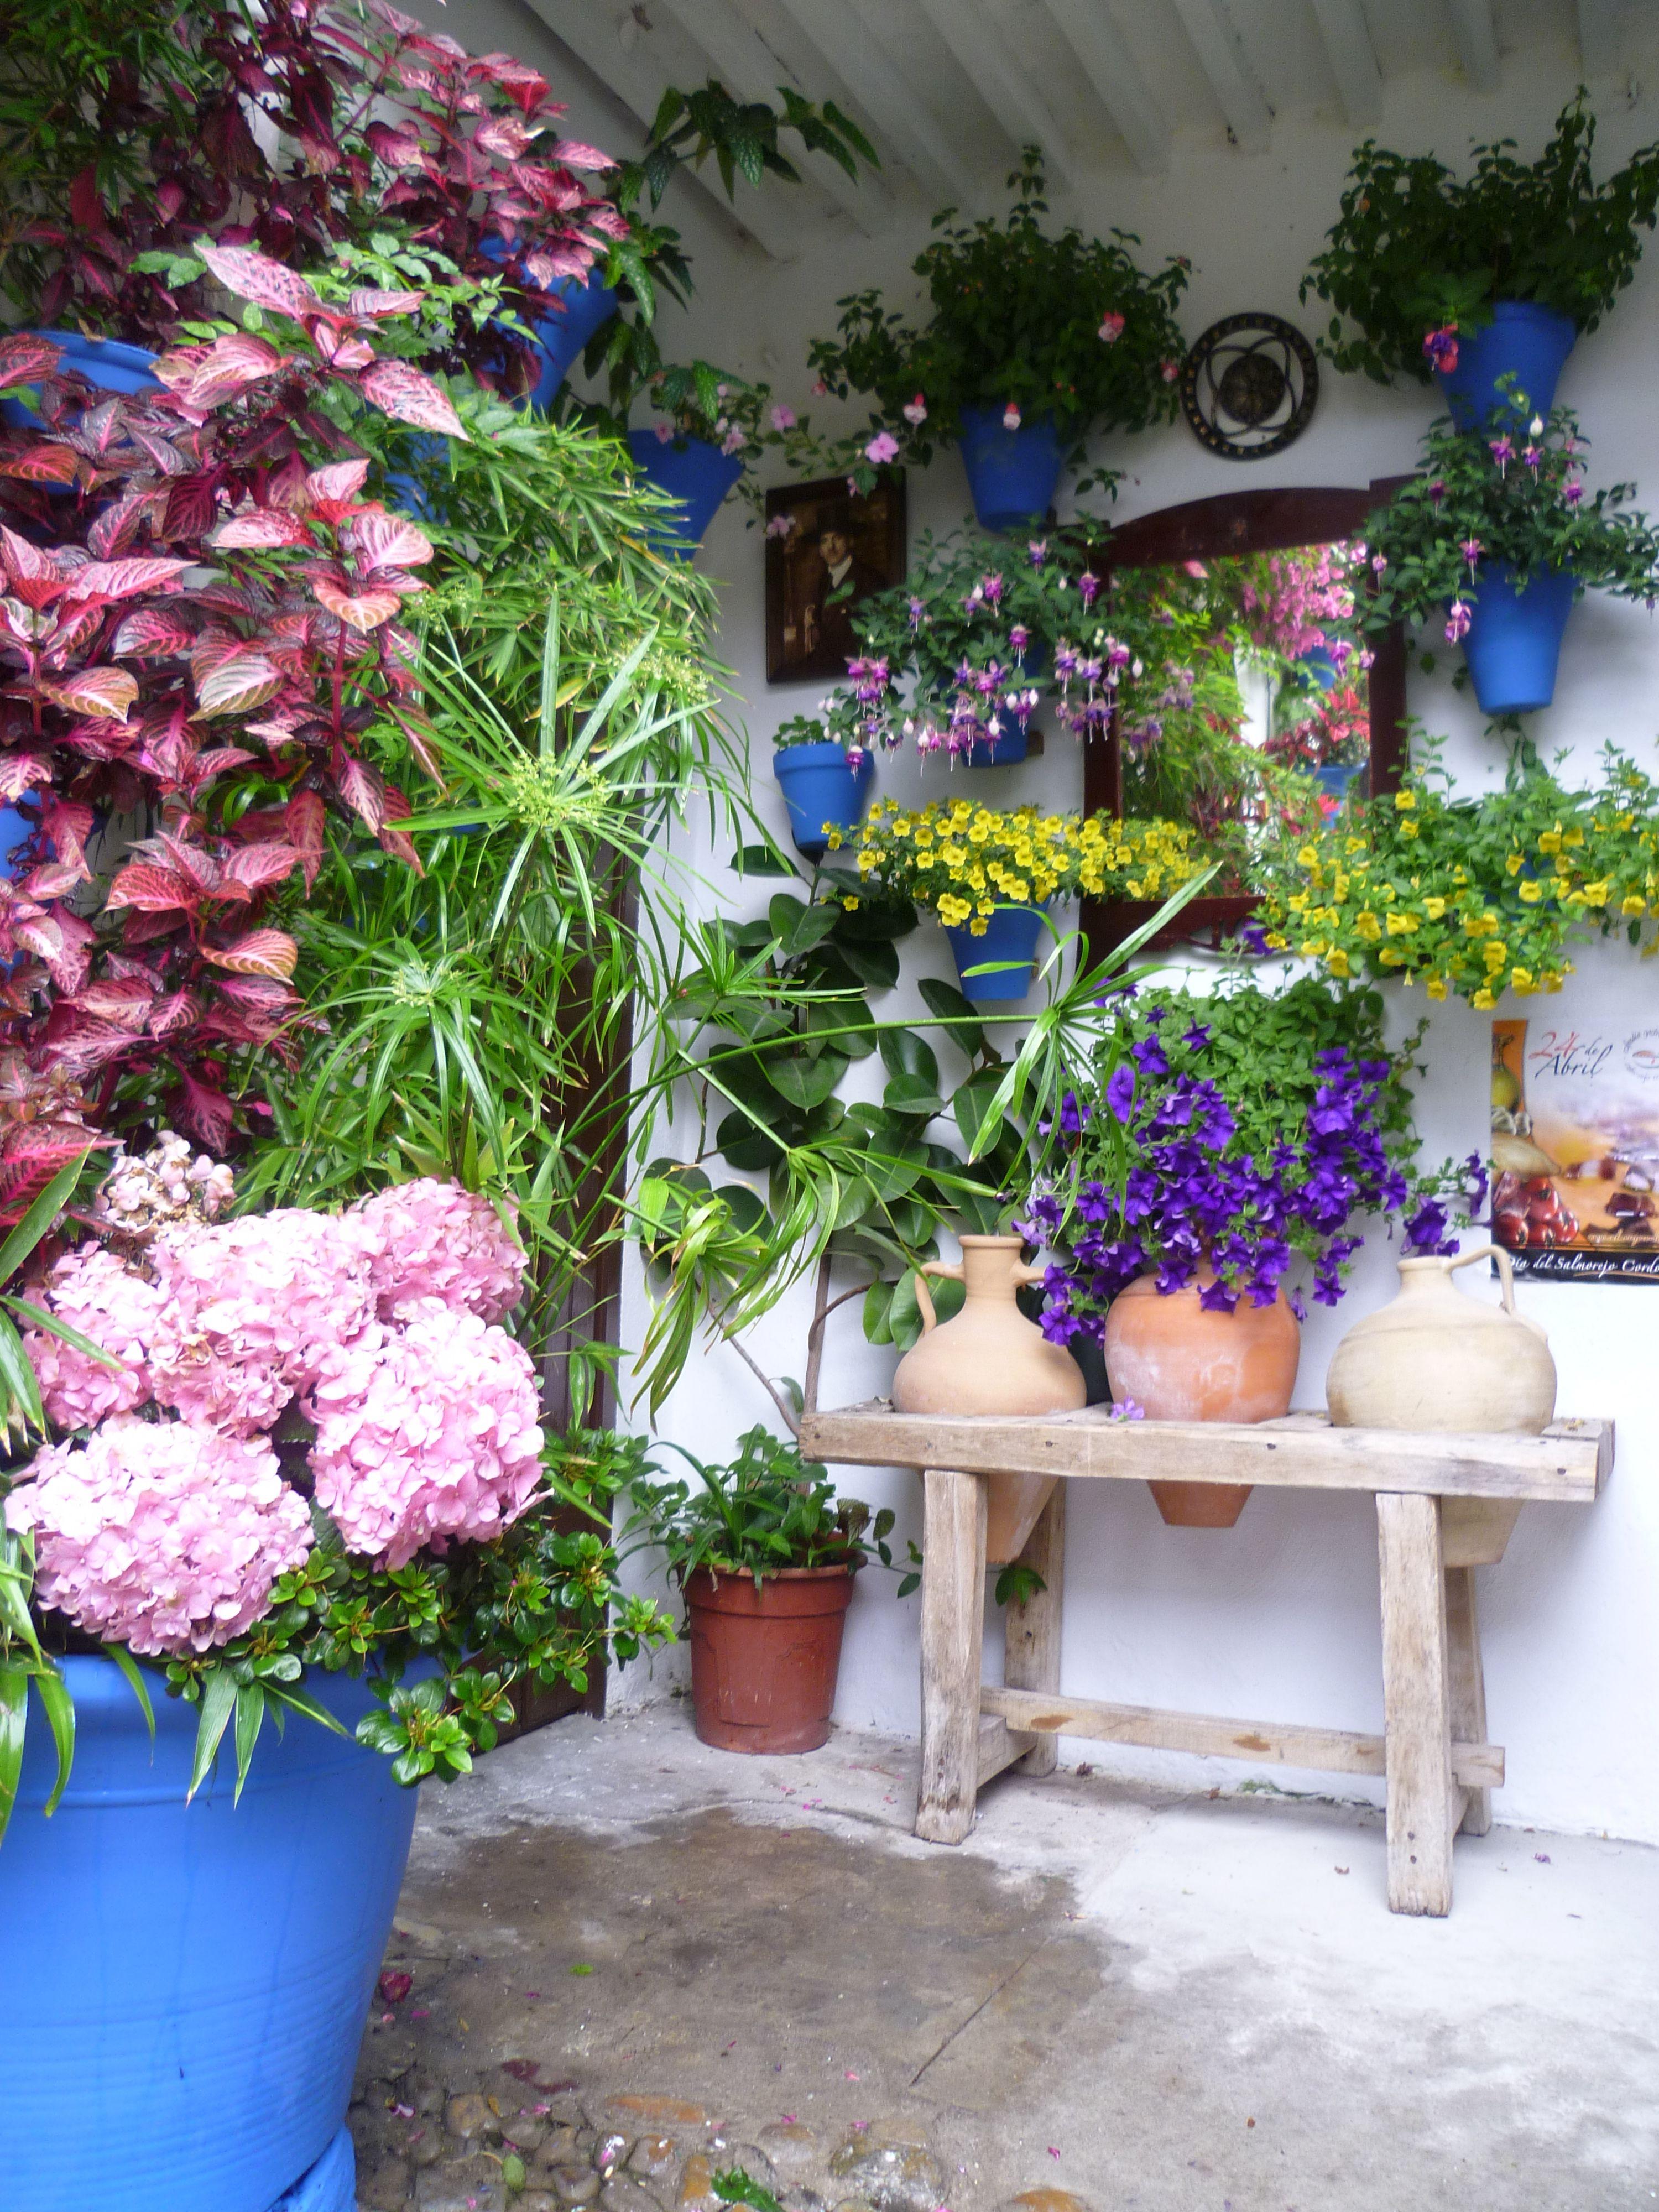 Los Patios Cordobeses Blue Flowering Plants Unique Gardens Planting Flowers